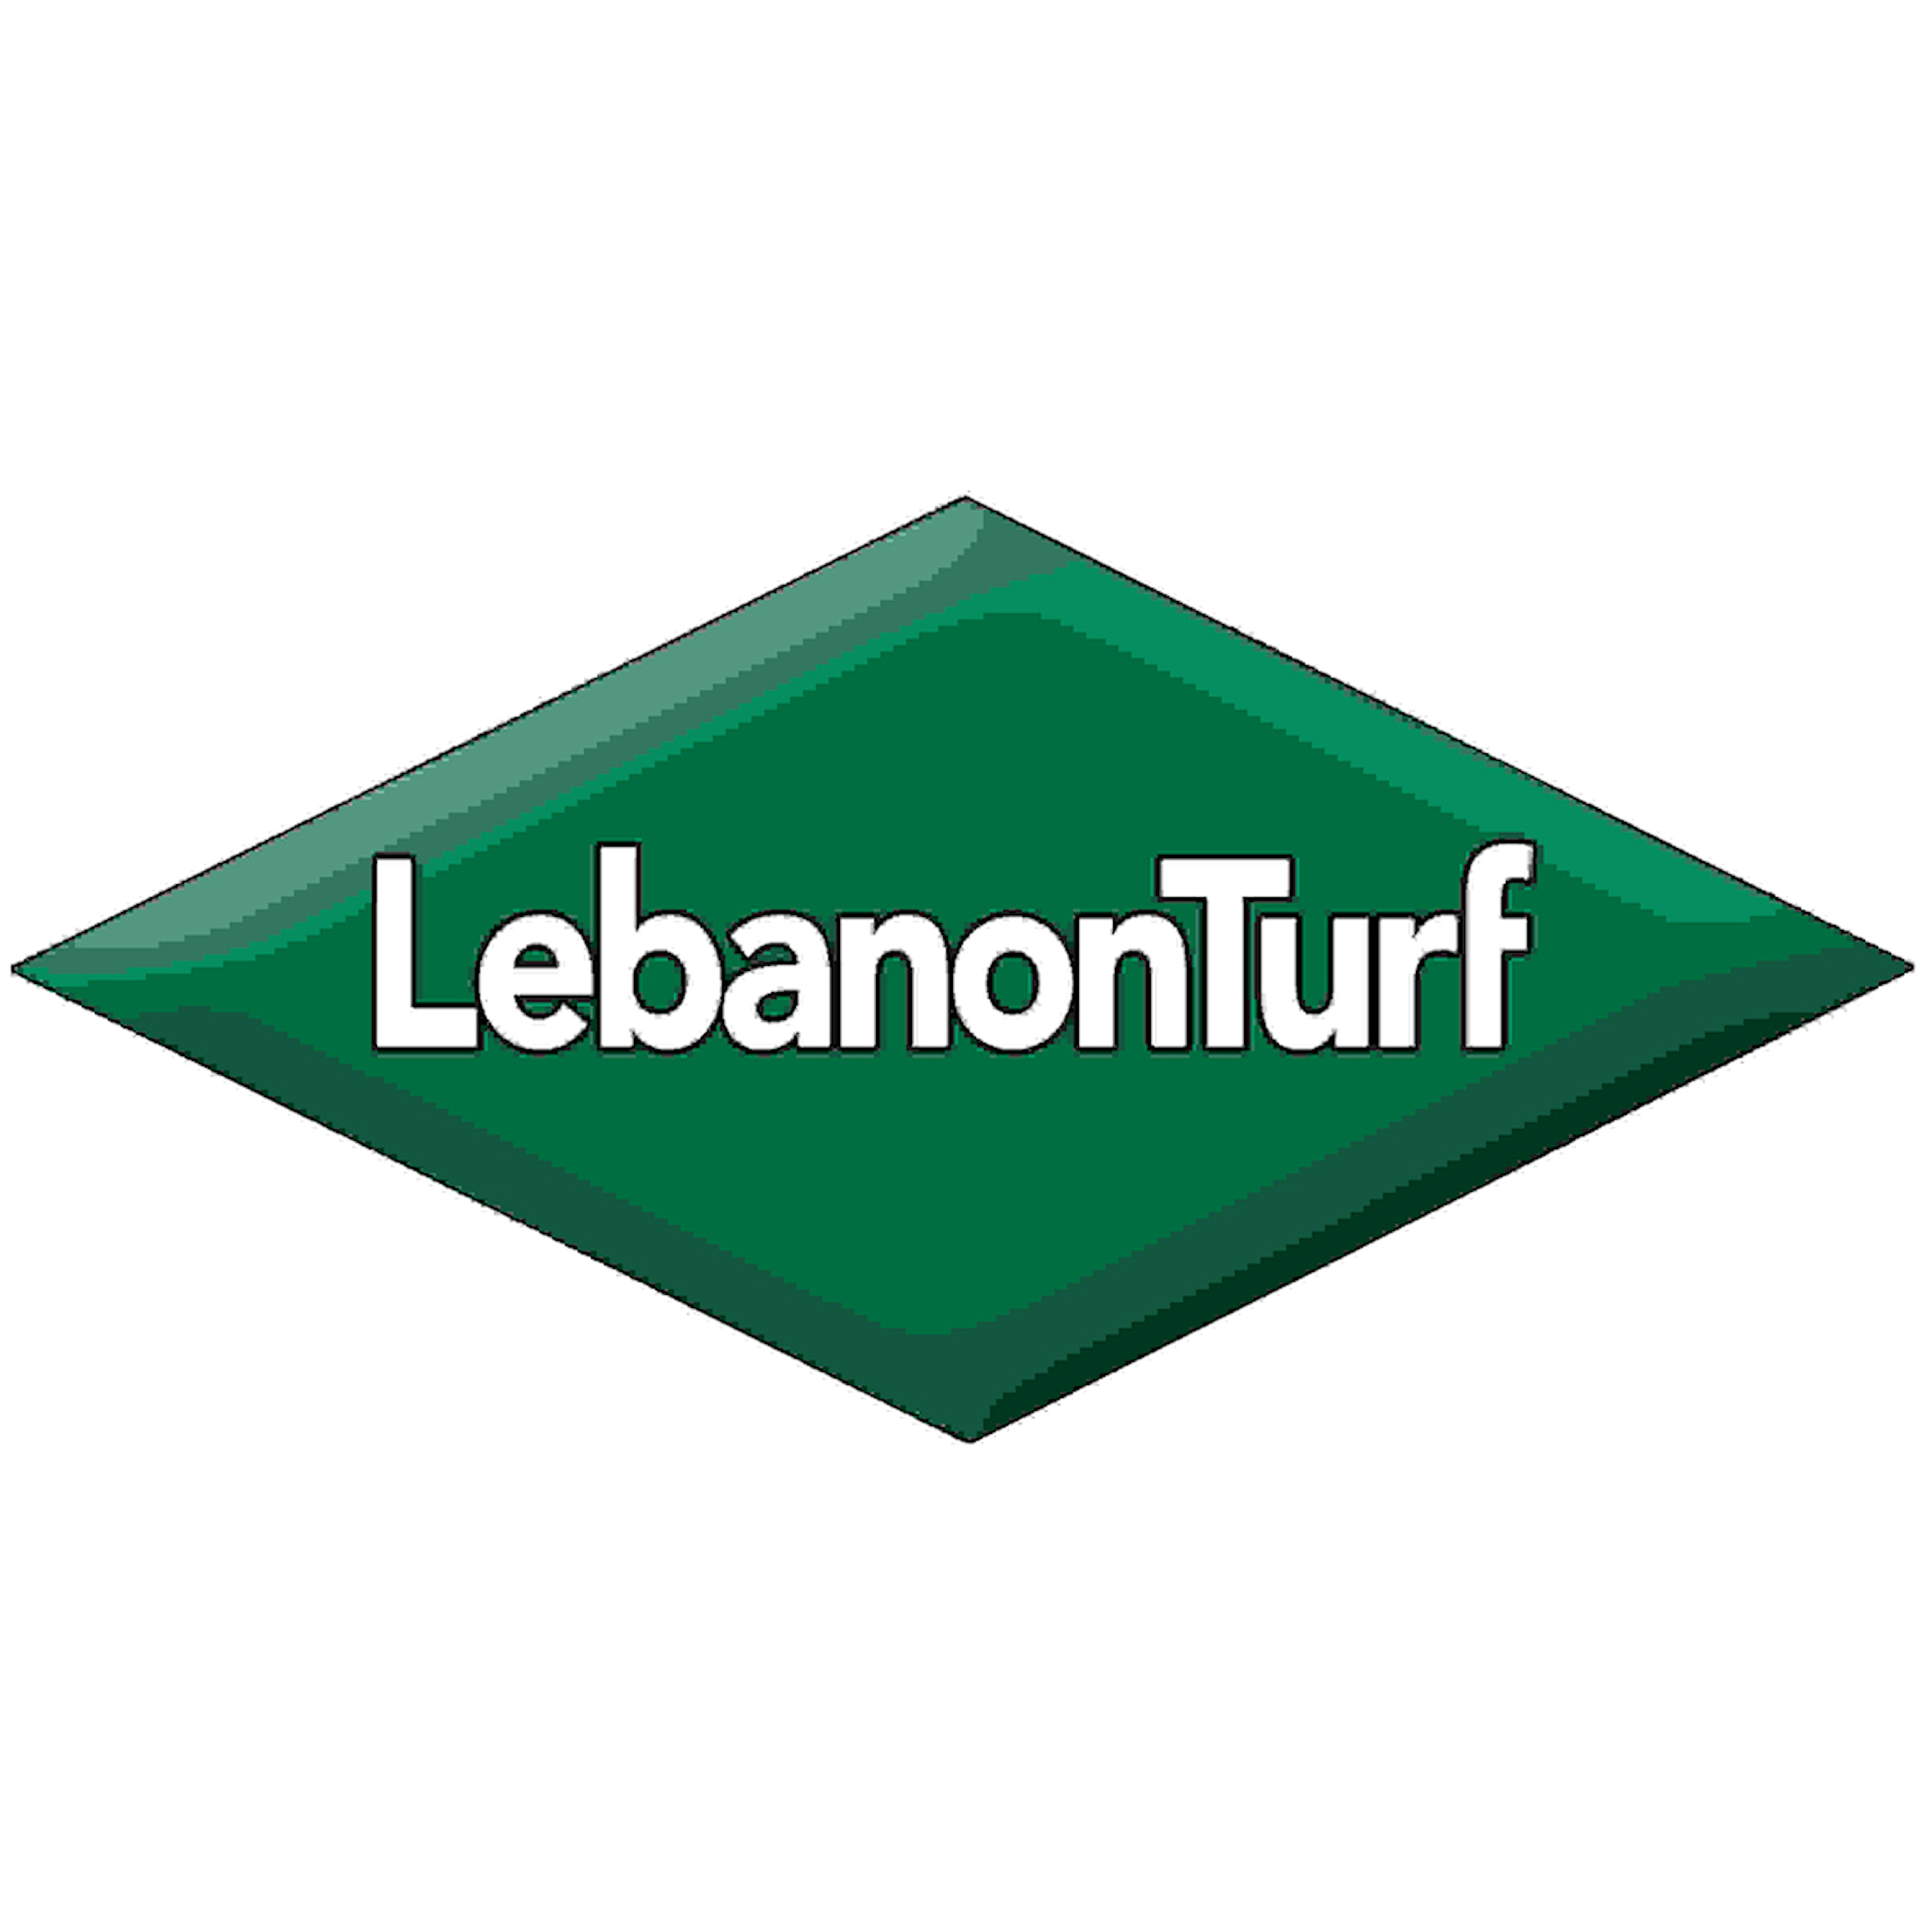 https://d347awuzx0kdse.cloudfront.net/prebble/content-image/Sup_Lebanon.jpg